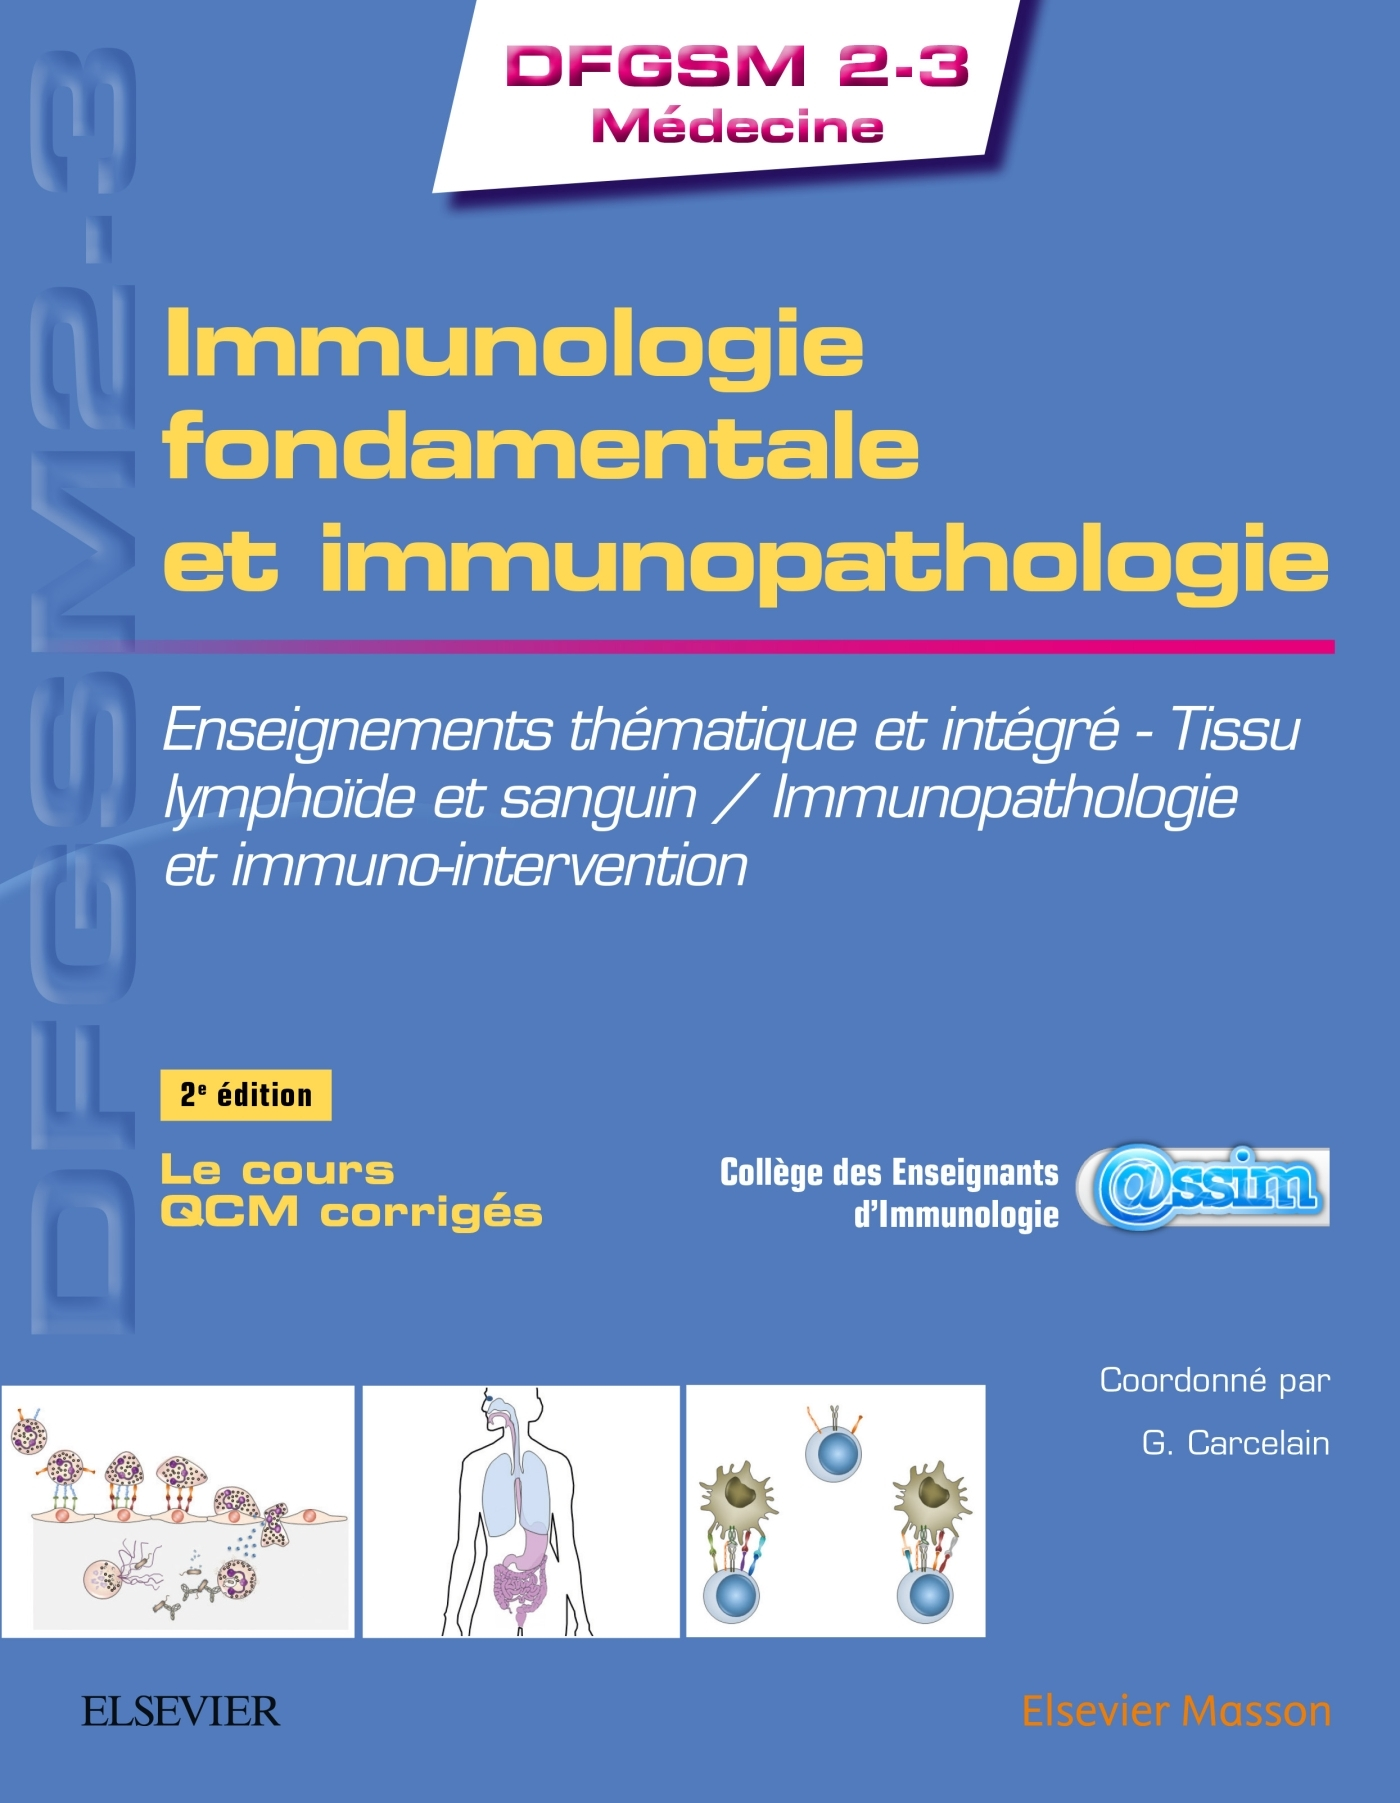 IMMUNOLOGIE FONDAMENTALE ET IMMUNOPATHOLOGIE - ENSEIGNEMENTS THEMATIQUE ET INTEGRE - TISSU LYMPHOIDE